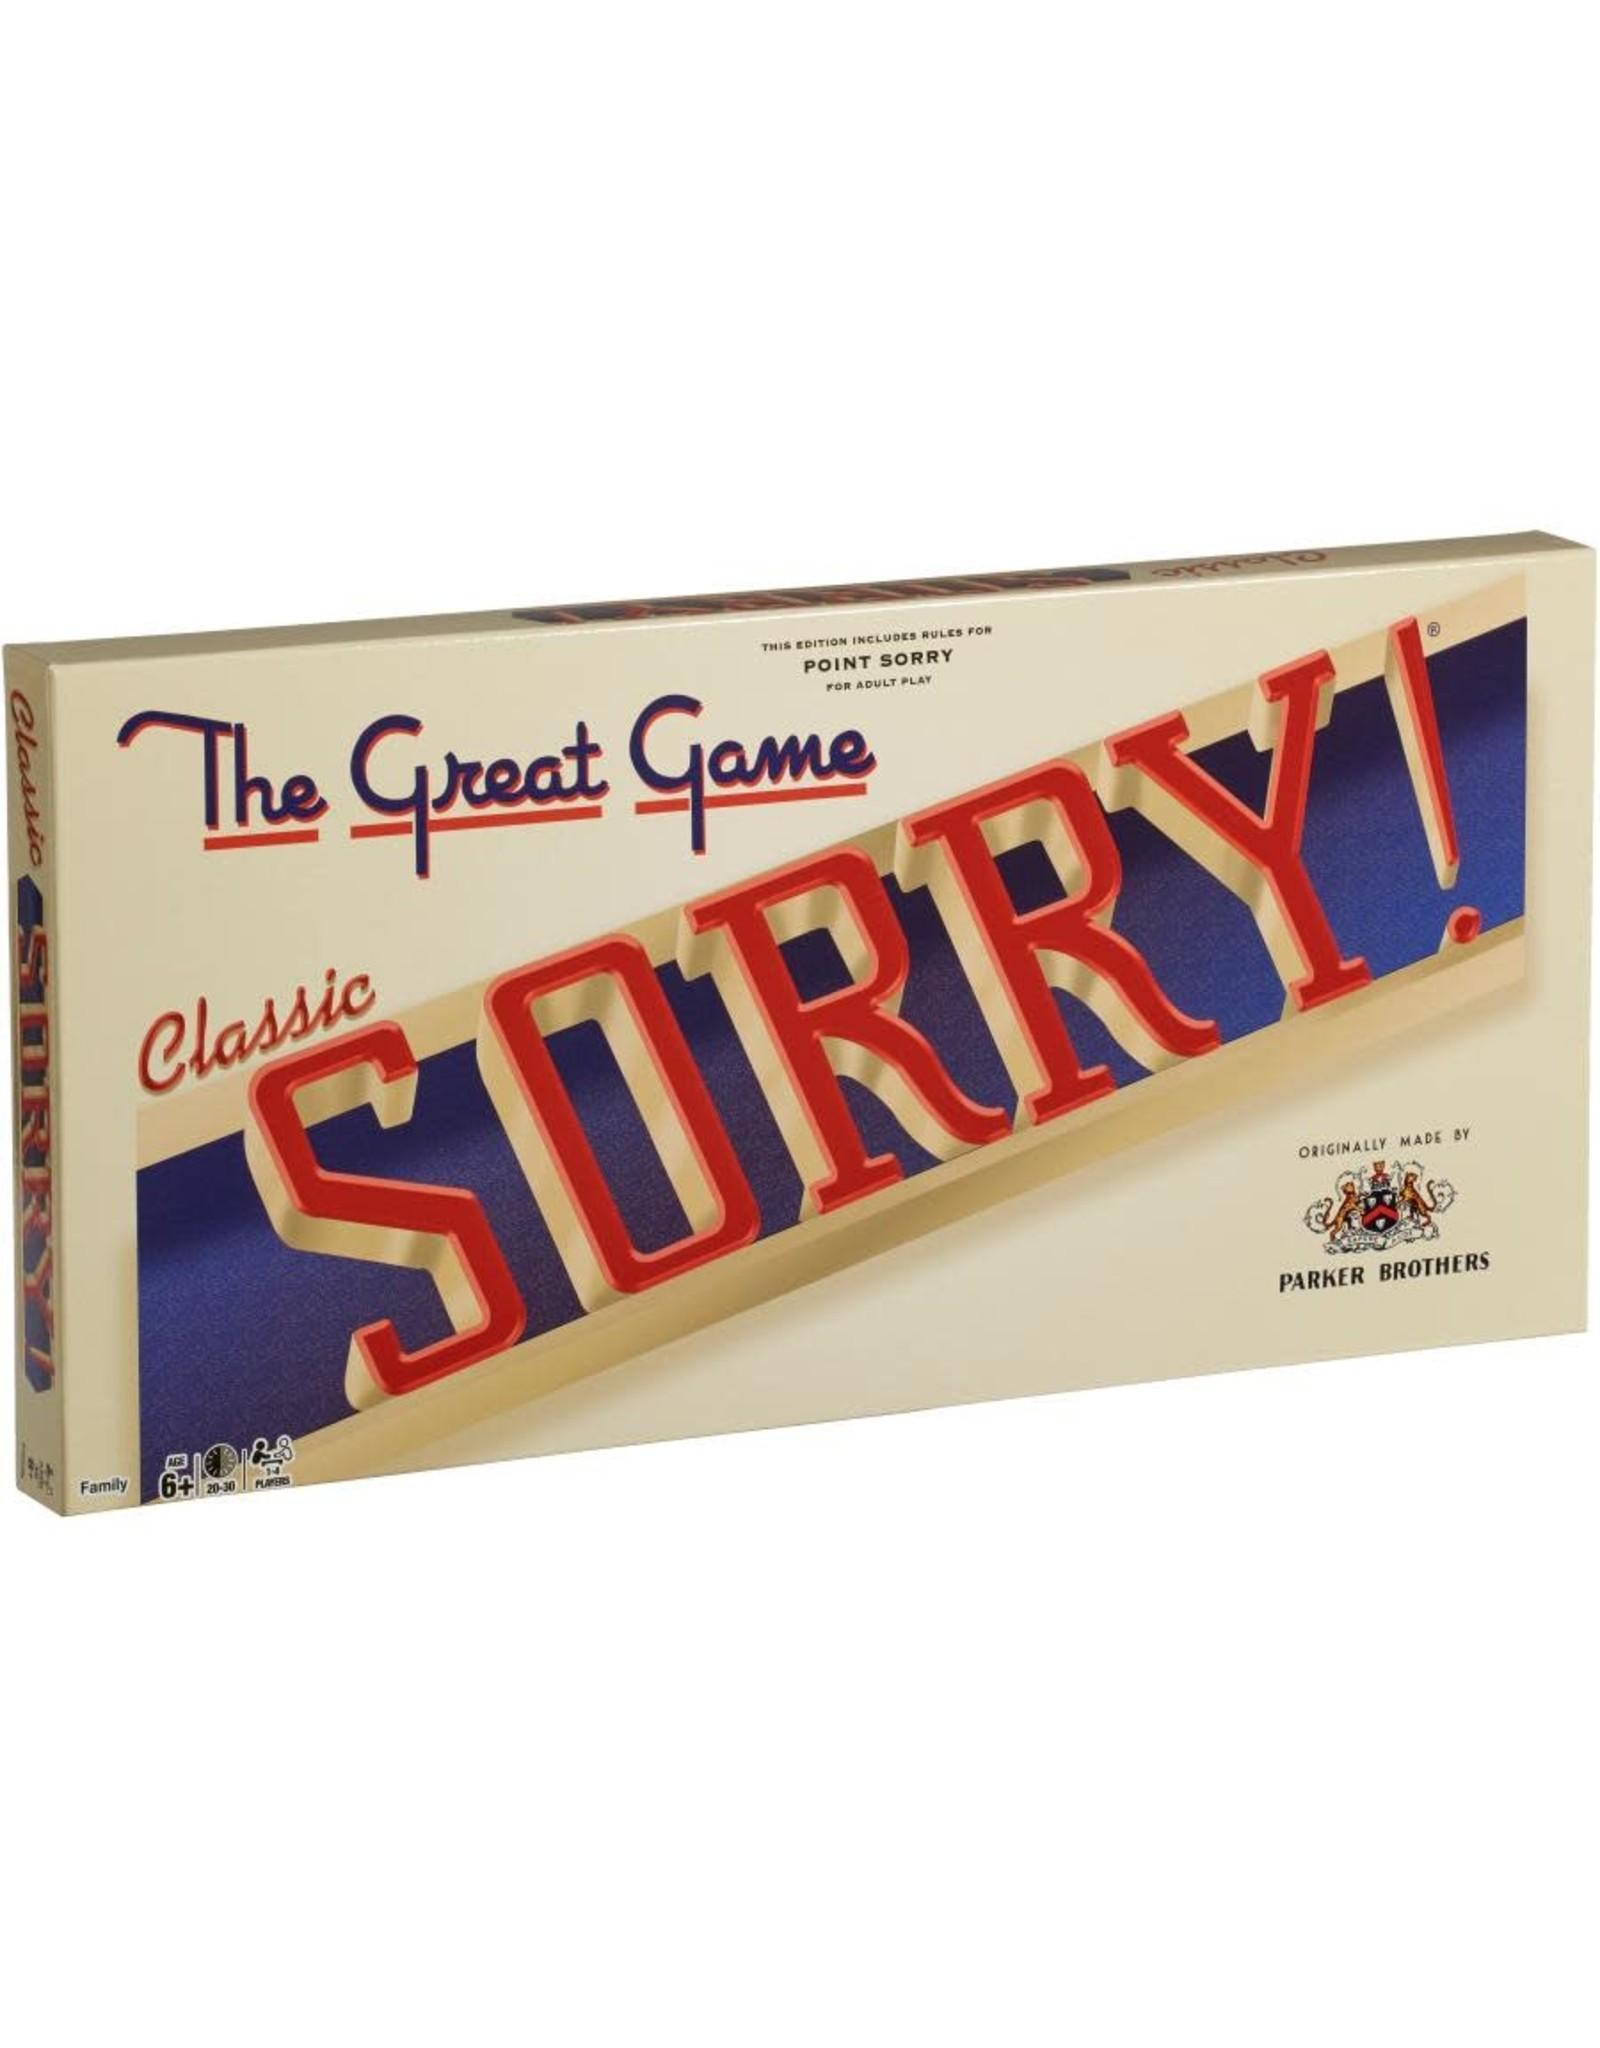 Hasbro Classic Sorry